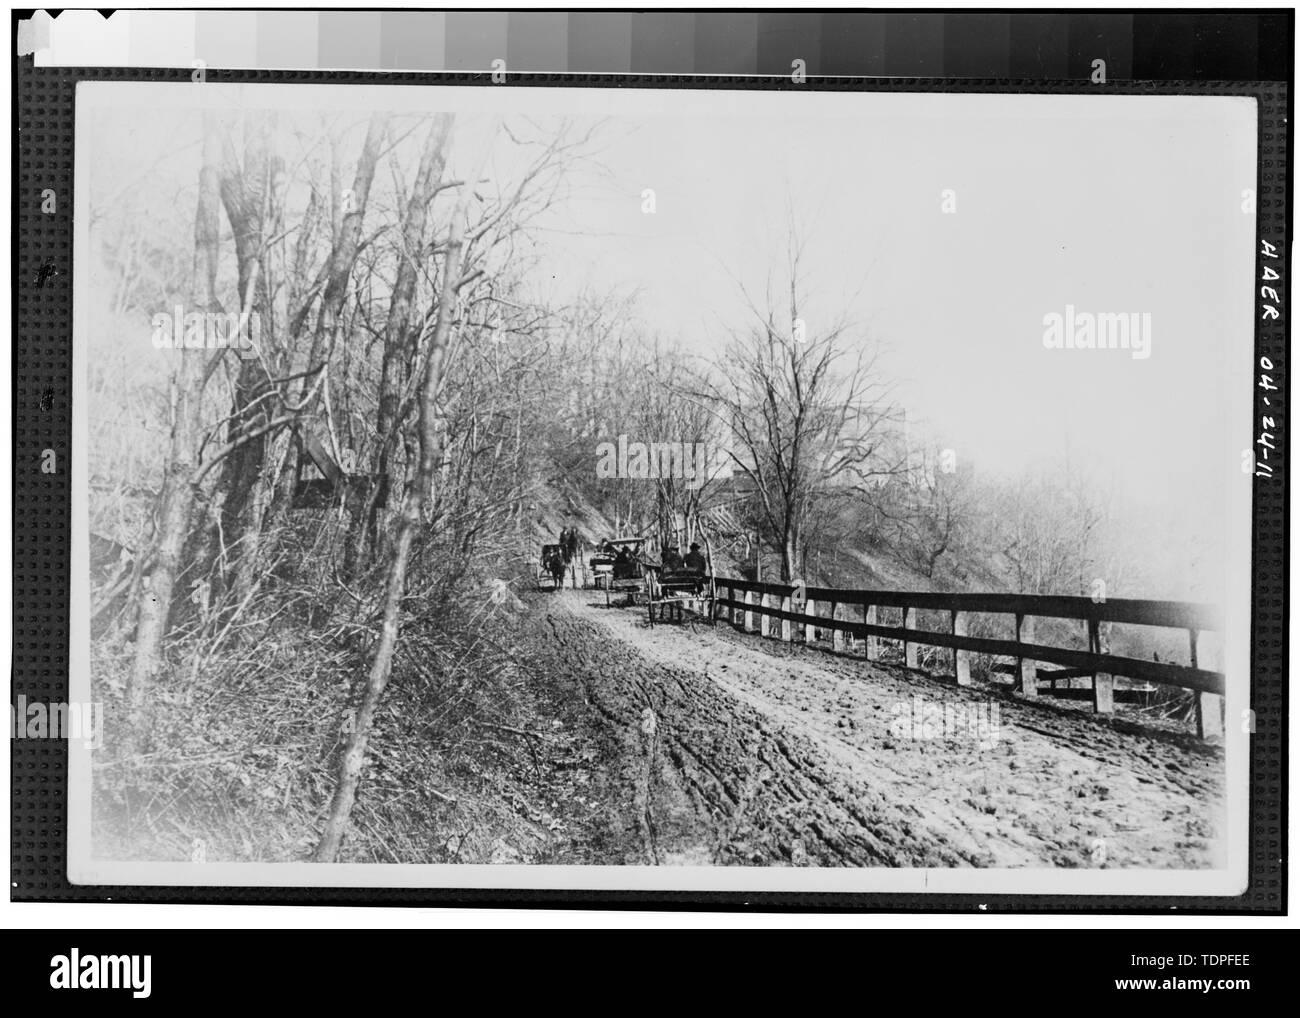 (from collection of Mrs. L. J. Fargo, Lexington, Ohio) showing HORSE DRAWN VEHICLES MEETING ON SIDEHILL TRAIL ON FULLERS HILL, 1890. - Forty-sixth Street Bridge, Spanning Ashtabula River, Ashtabula, Ashtabula County, OH - Stock Image